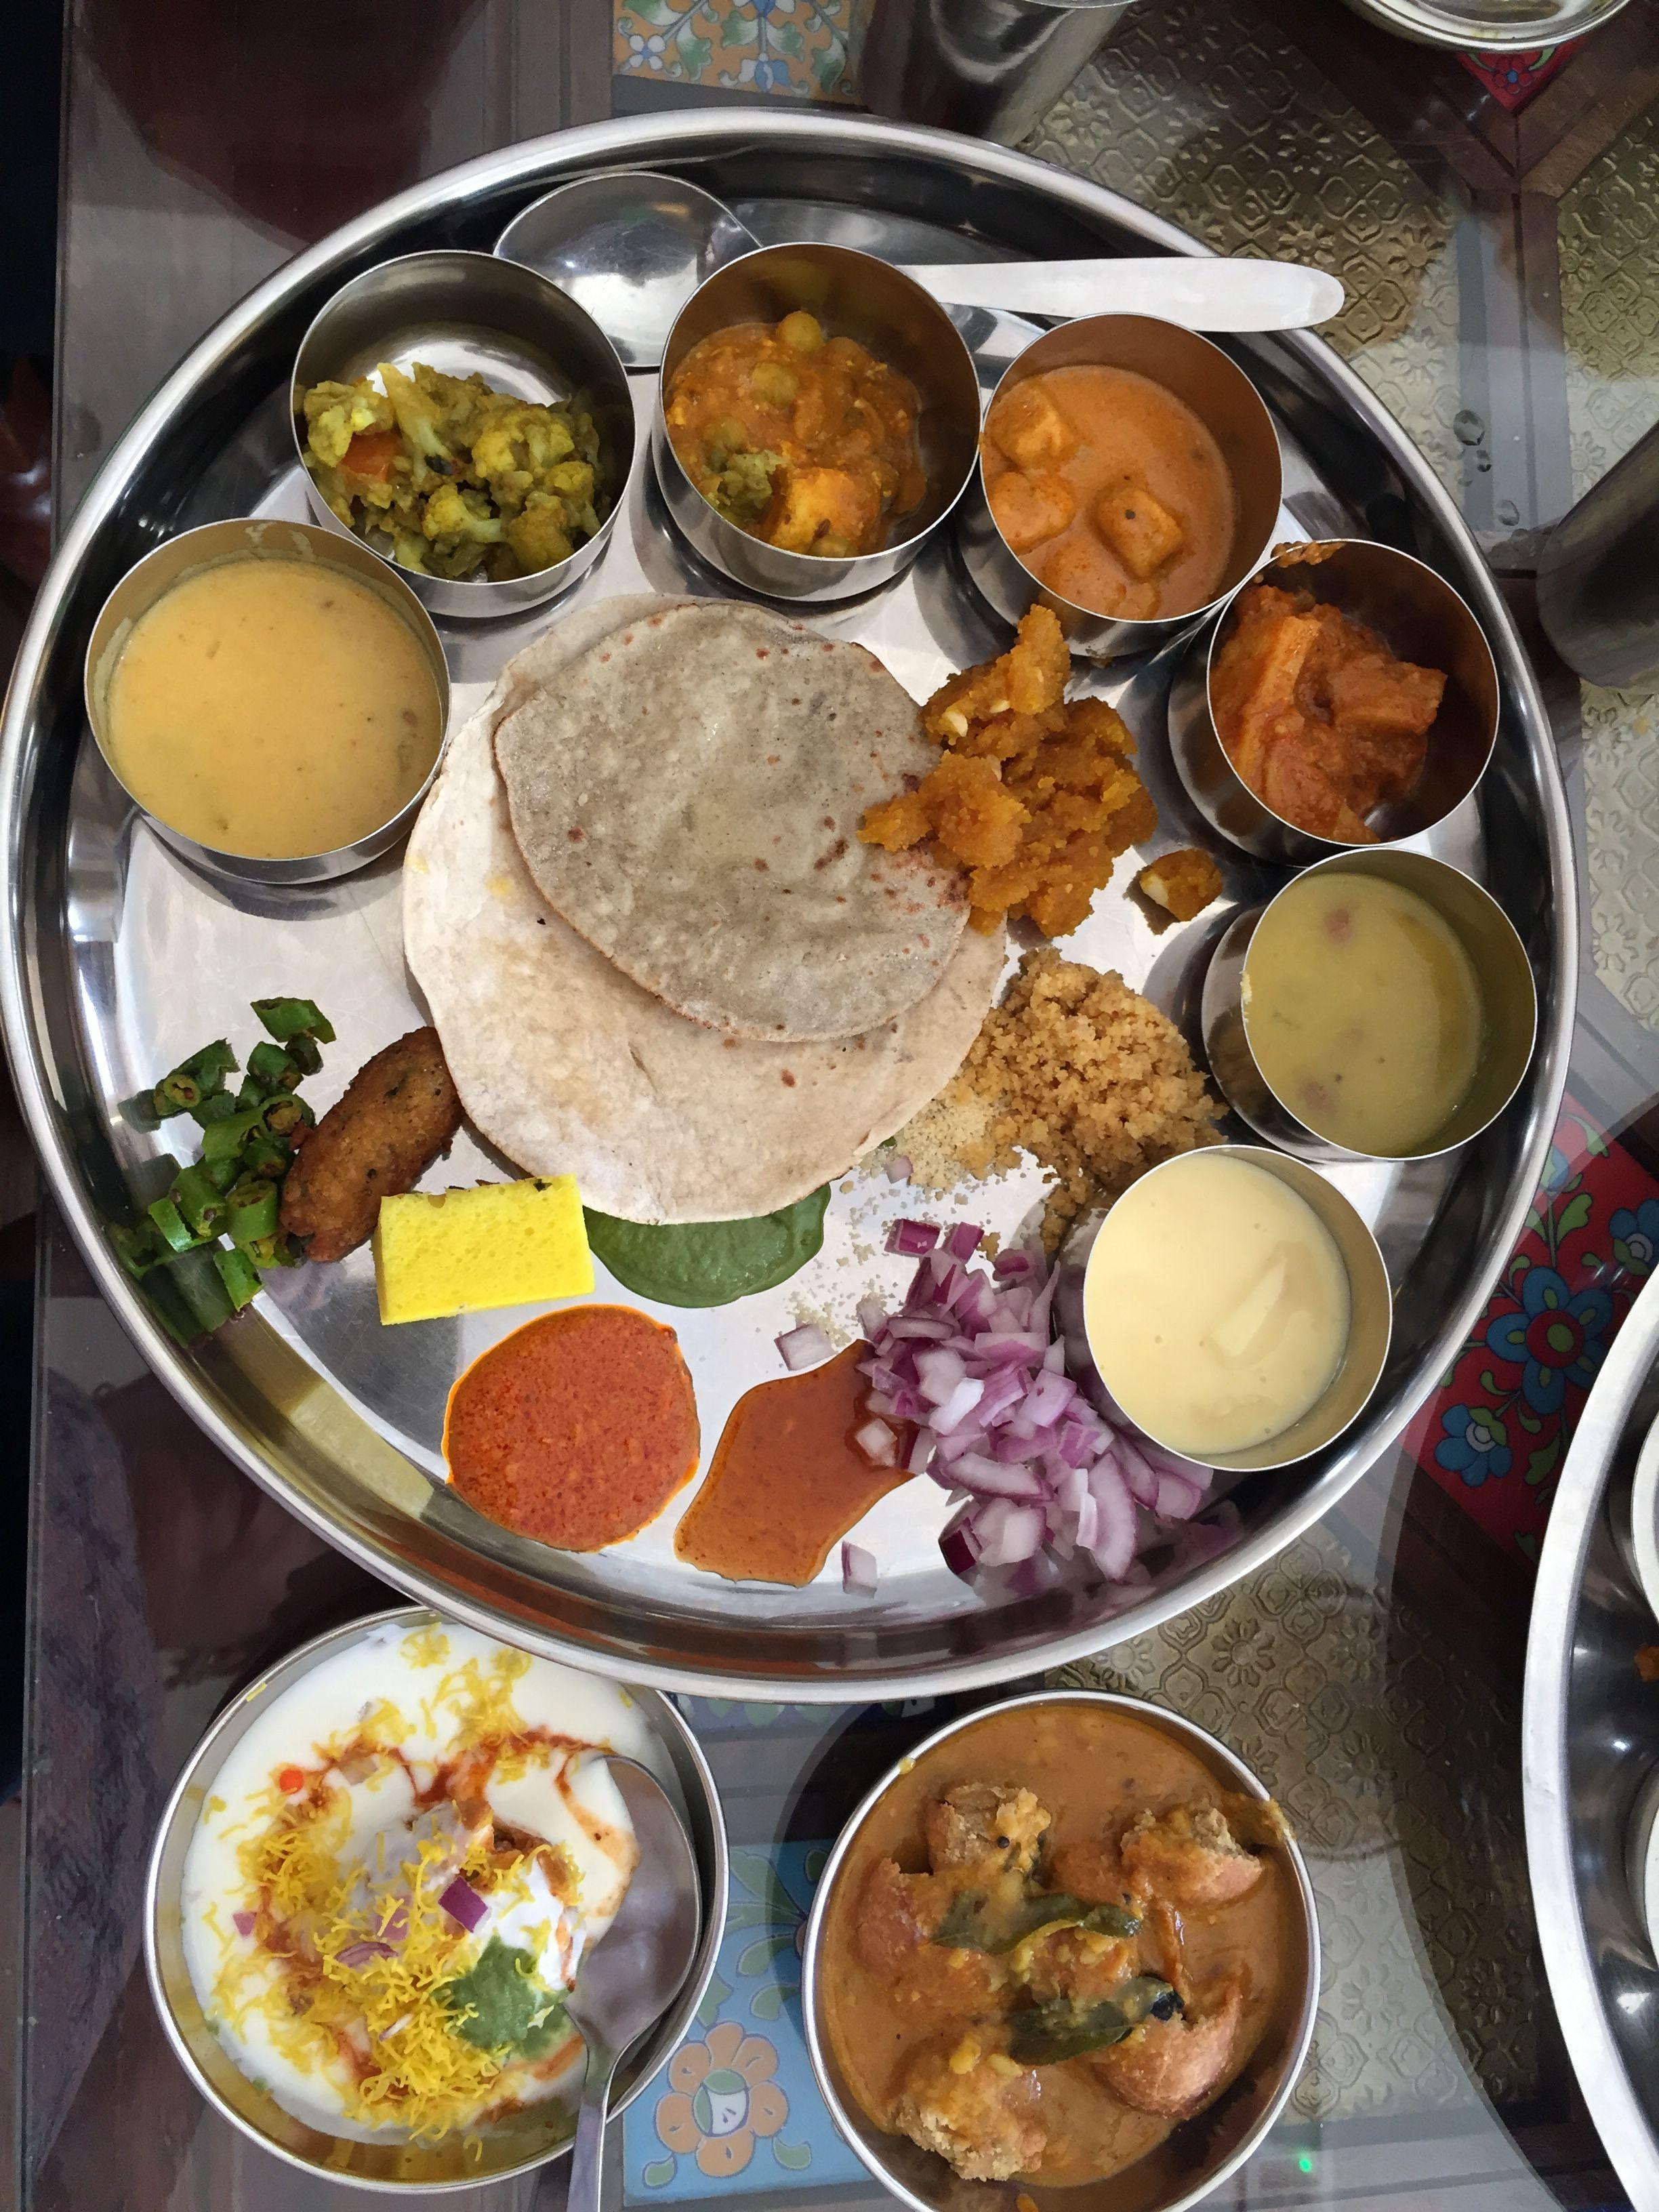 A Rajasthani Vegetarian Thali From Rajasthan Restaurant In Sharjah Uae Indian Food Recipes Indian Cooking India Food